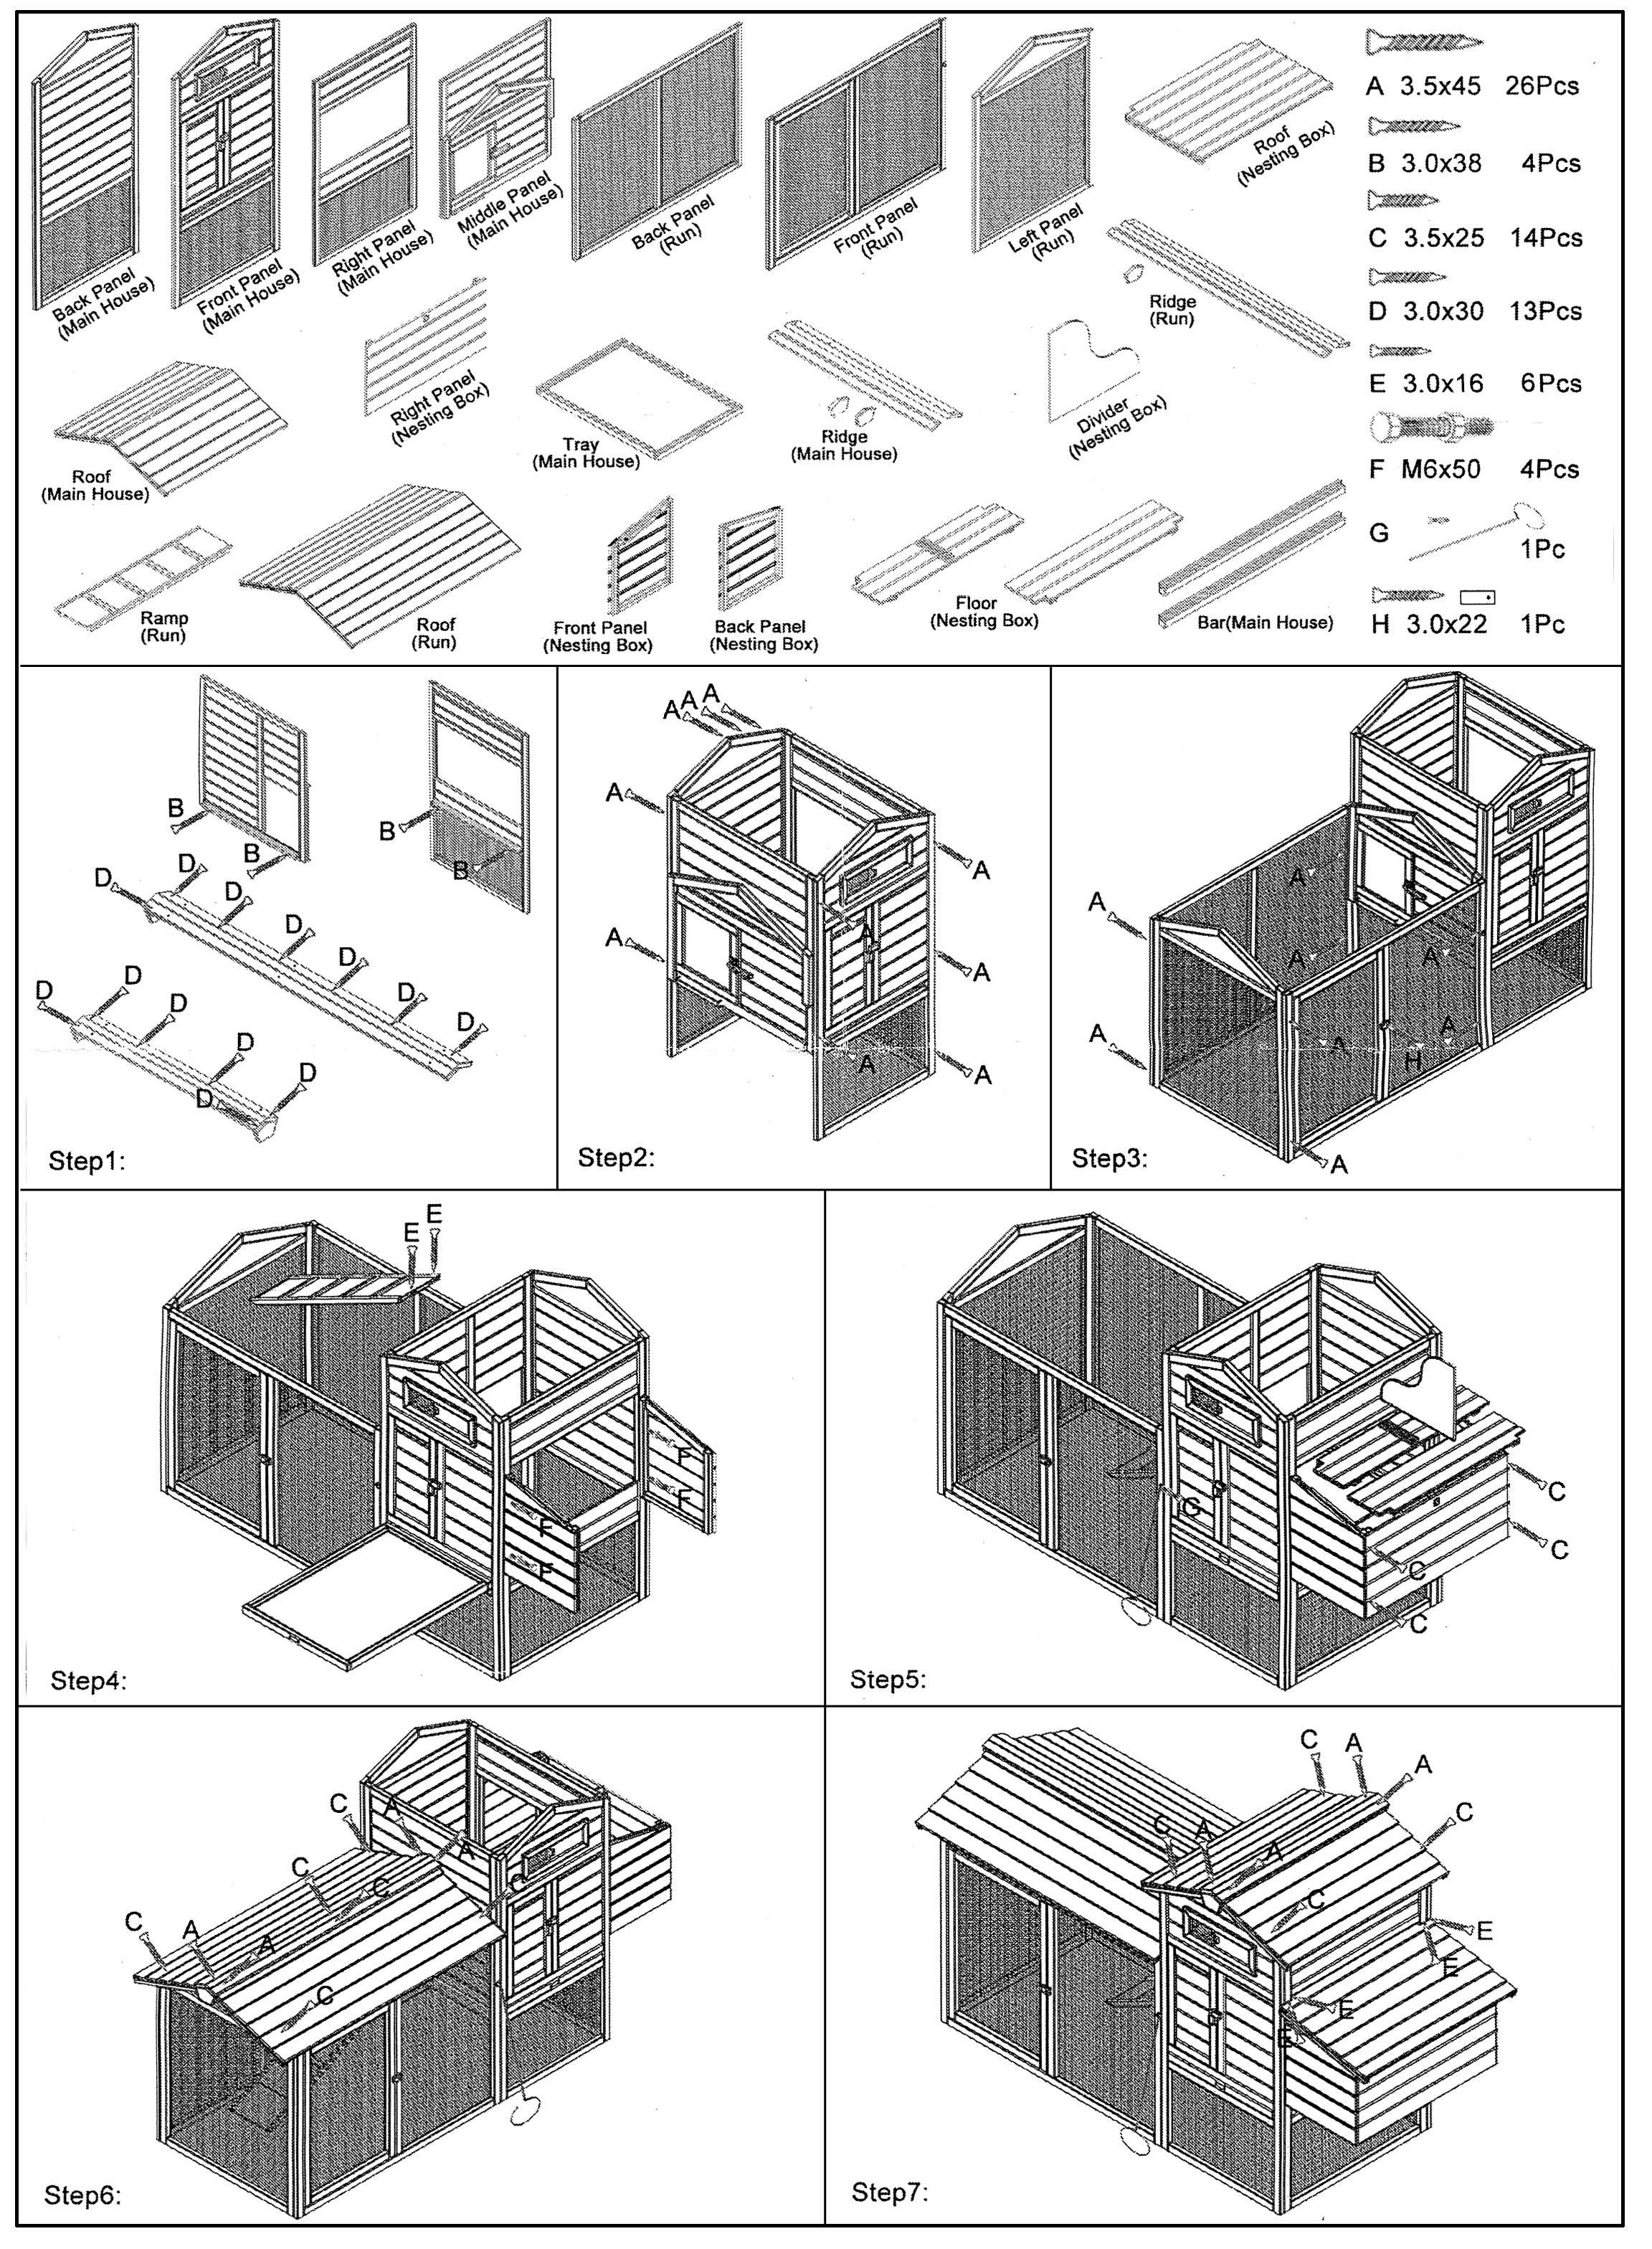 e44546f19ad5 Ξύλινο σπιτάκι-κλουβί διώροφο για κουνέλια και κότες τύπου καλύβας